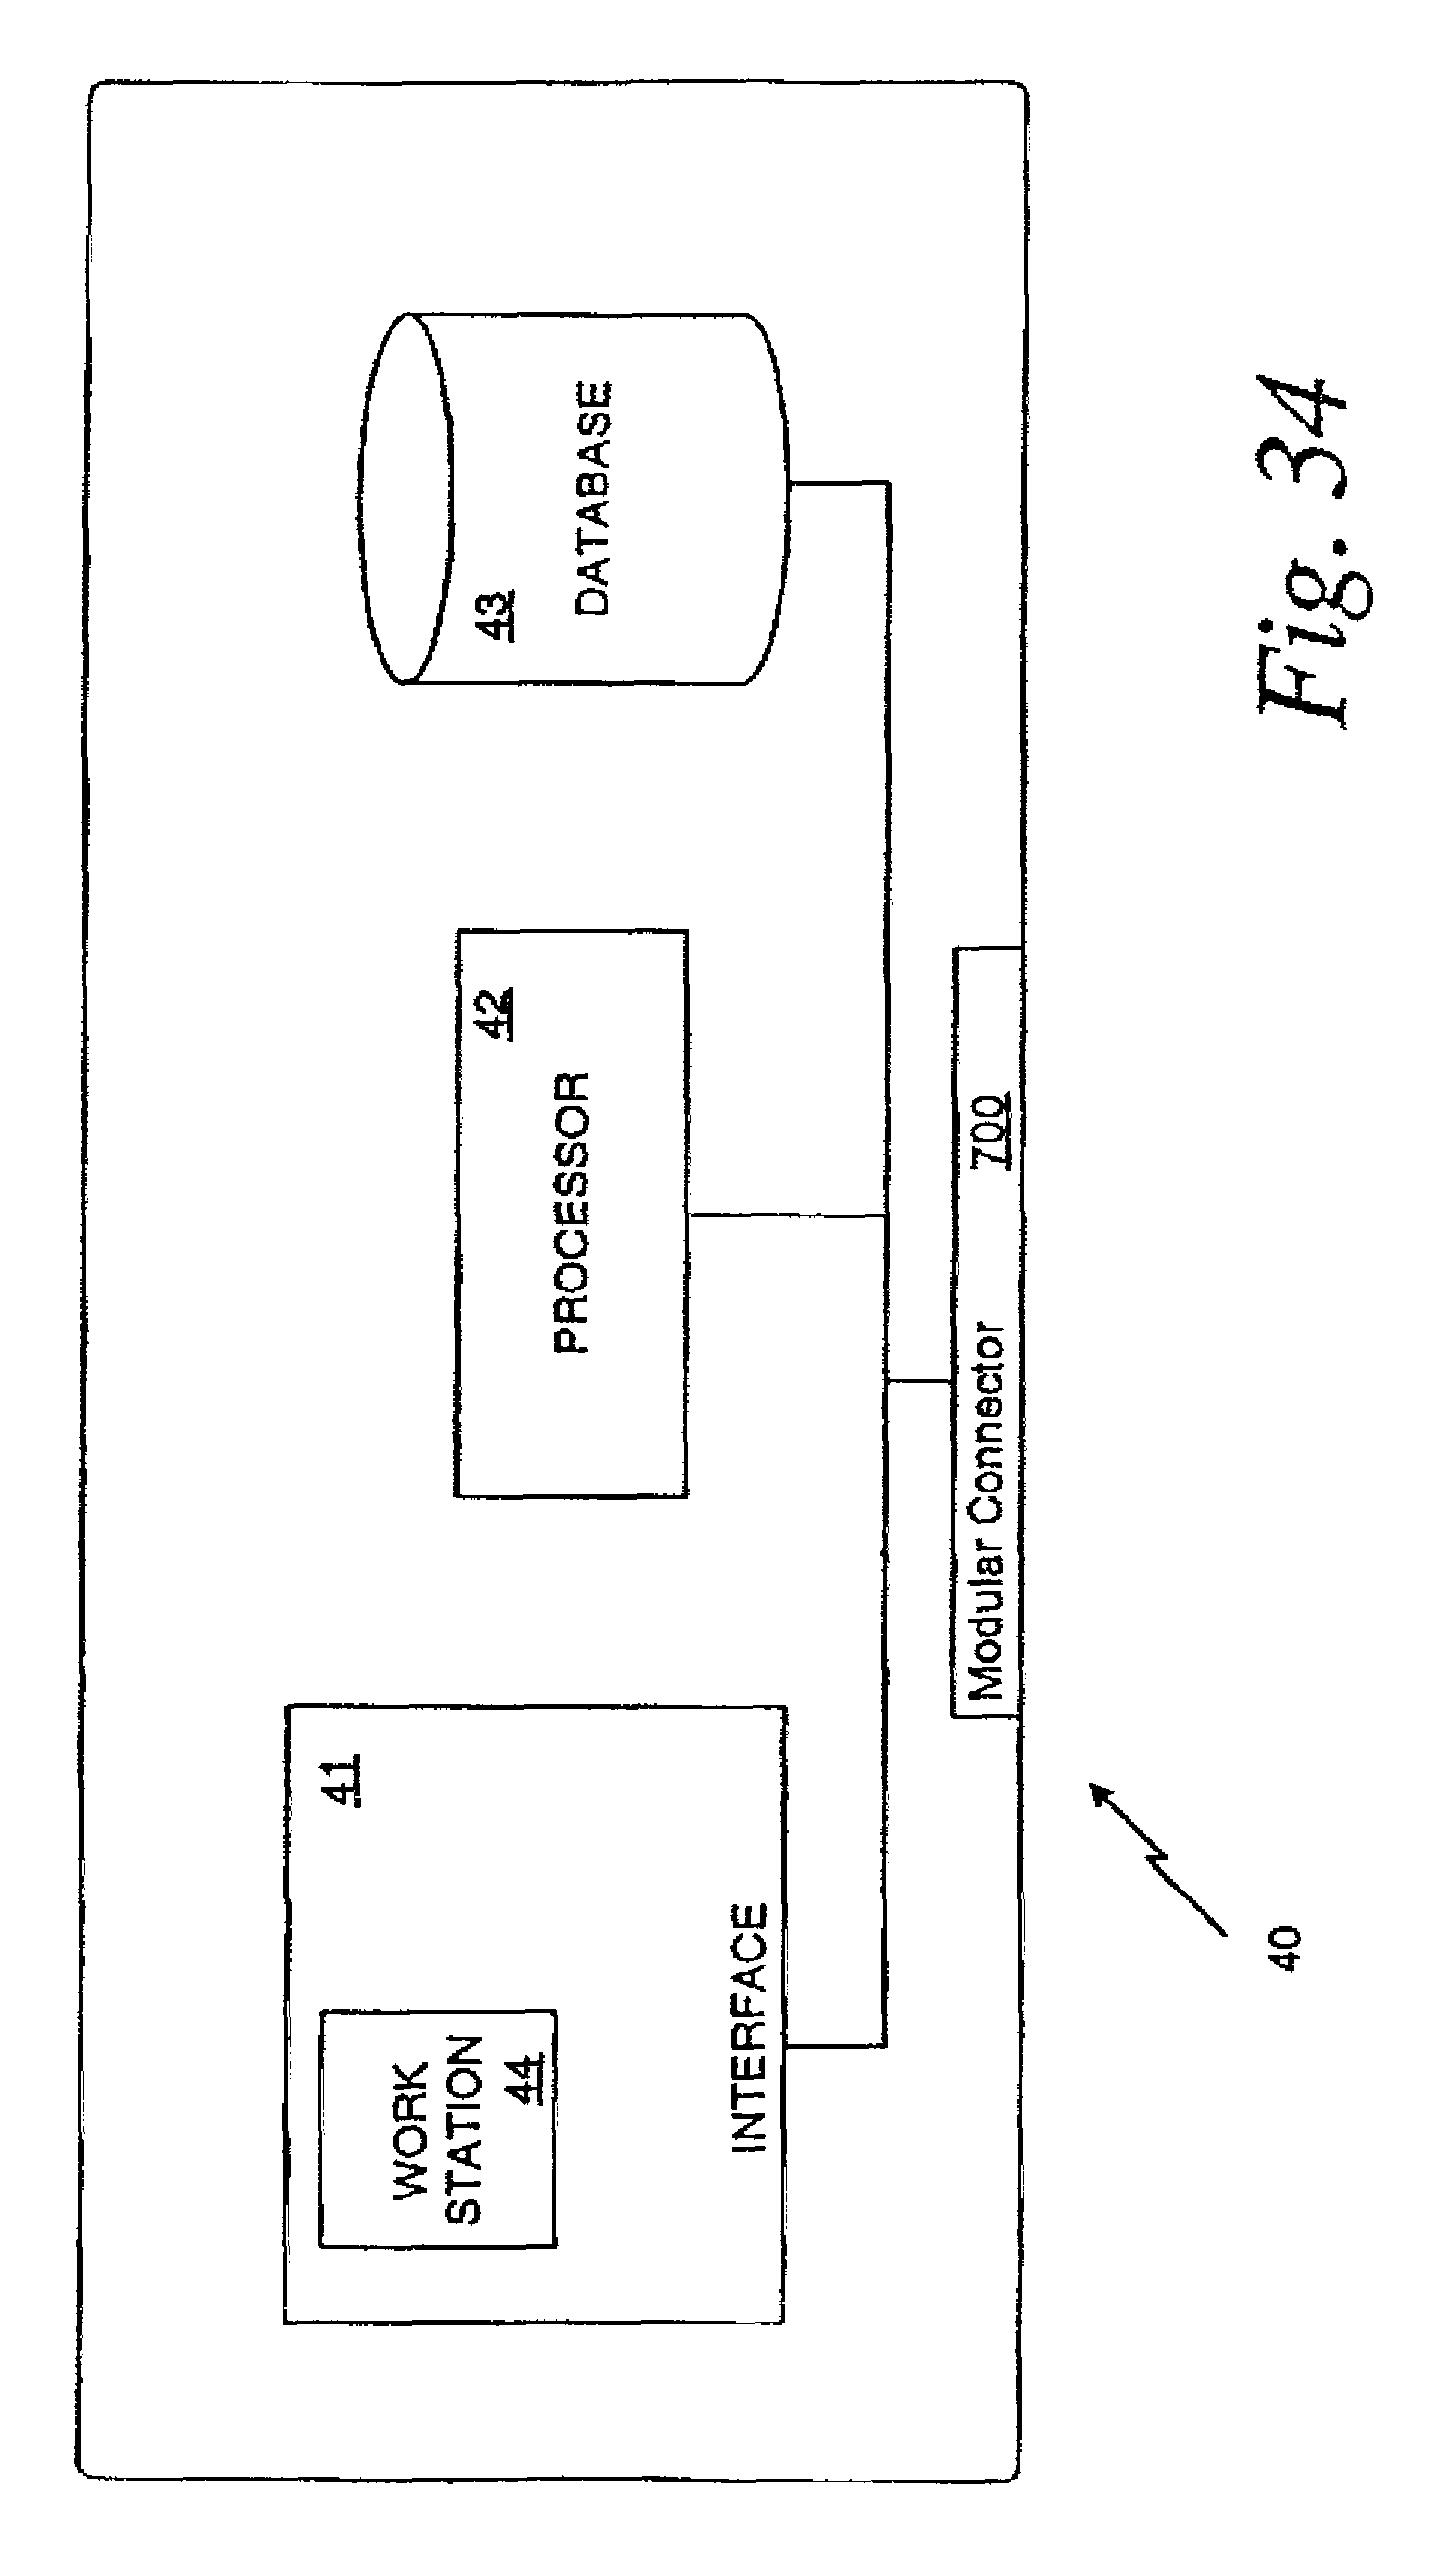 Patent US 9,813,641 B2